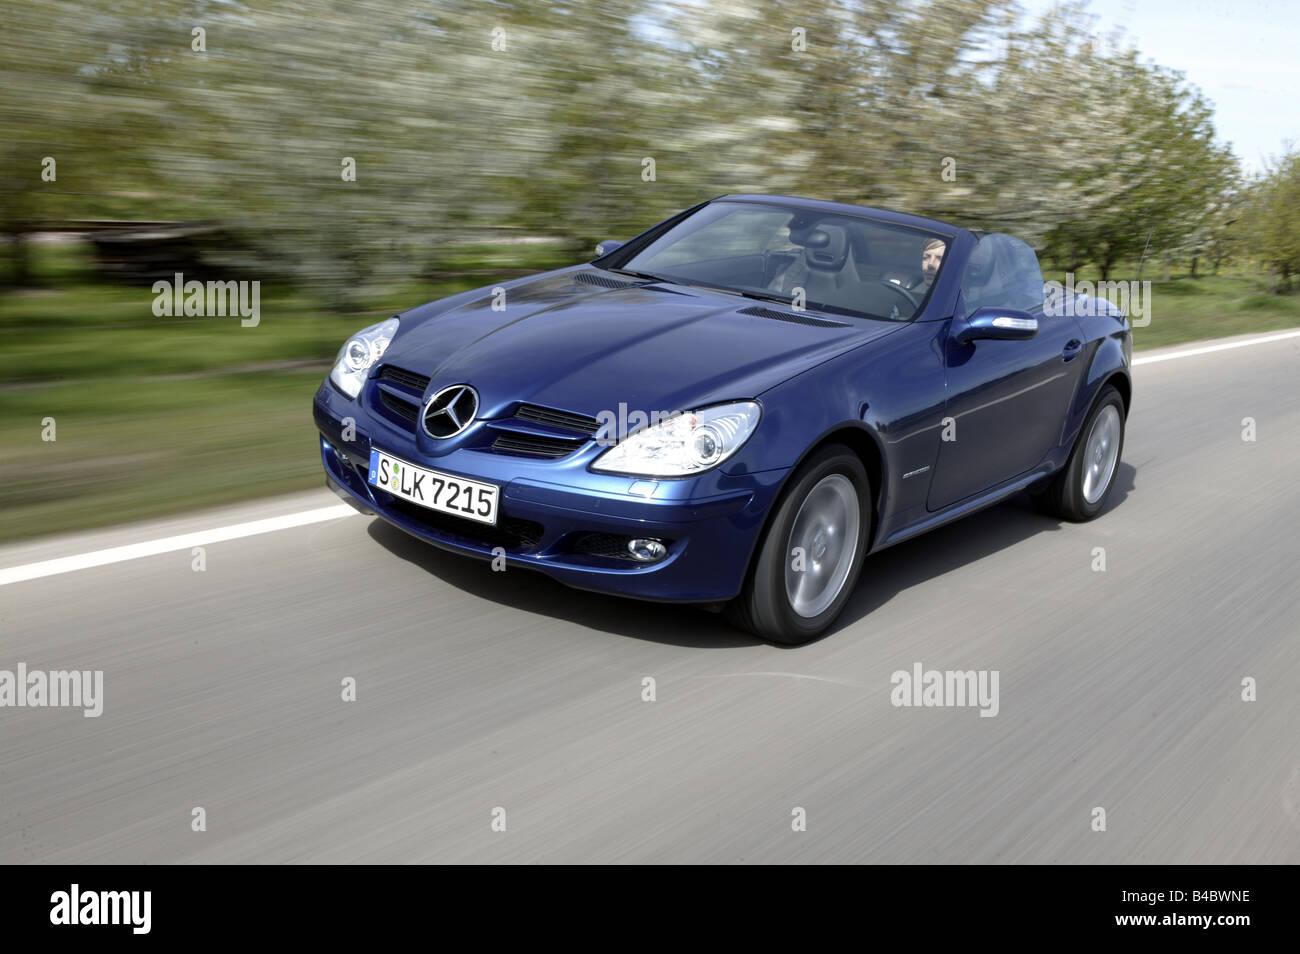 auto mercedes slk 200 kompressor cabrio modell jahr. Black Bedroom Furniture Sets. Home Design Ideas